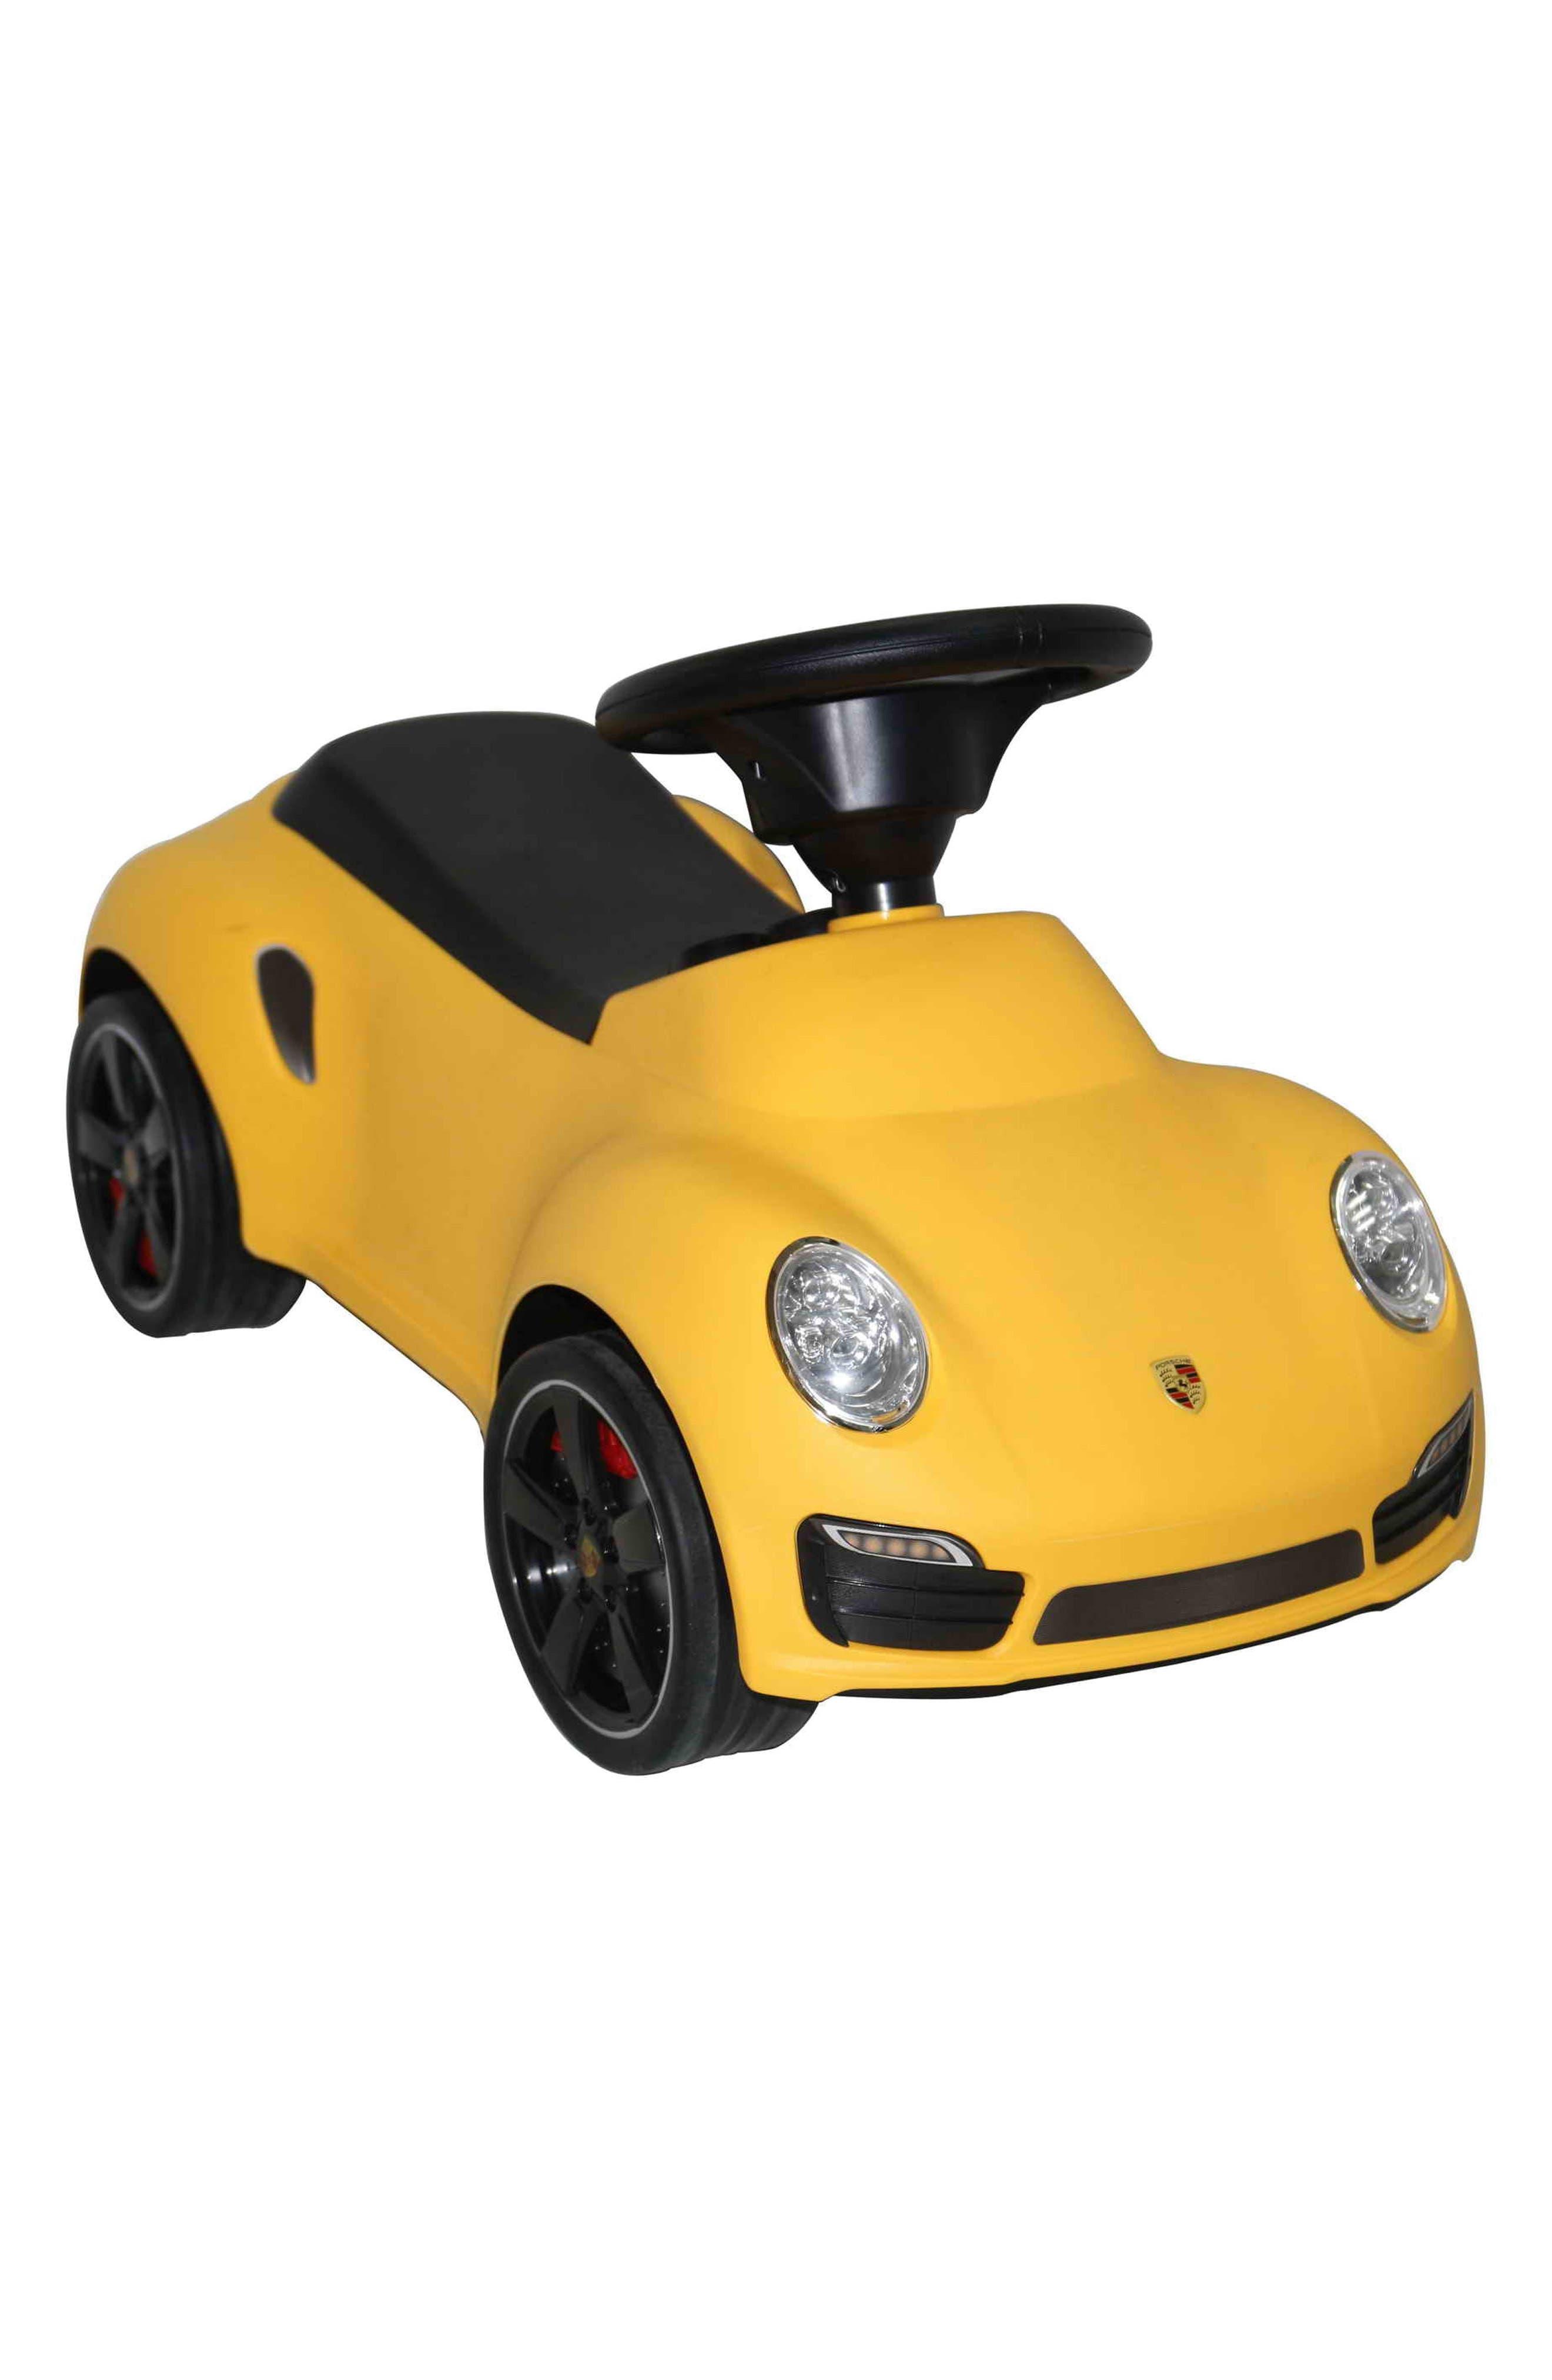 Main Image - Best Ride on Cars Porsche Turbo 911 Ride-On Push Car